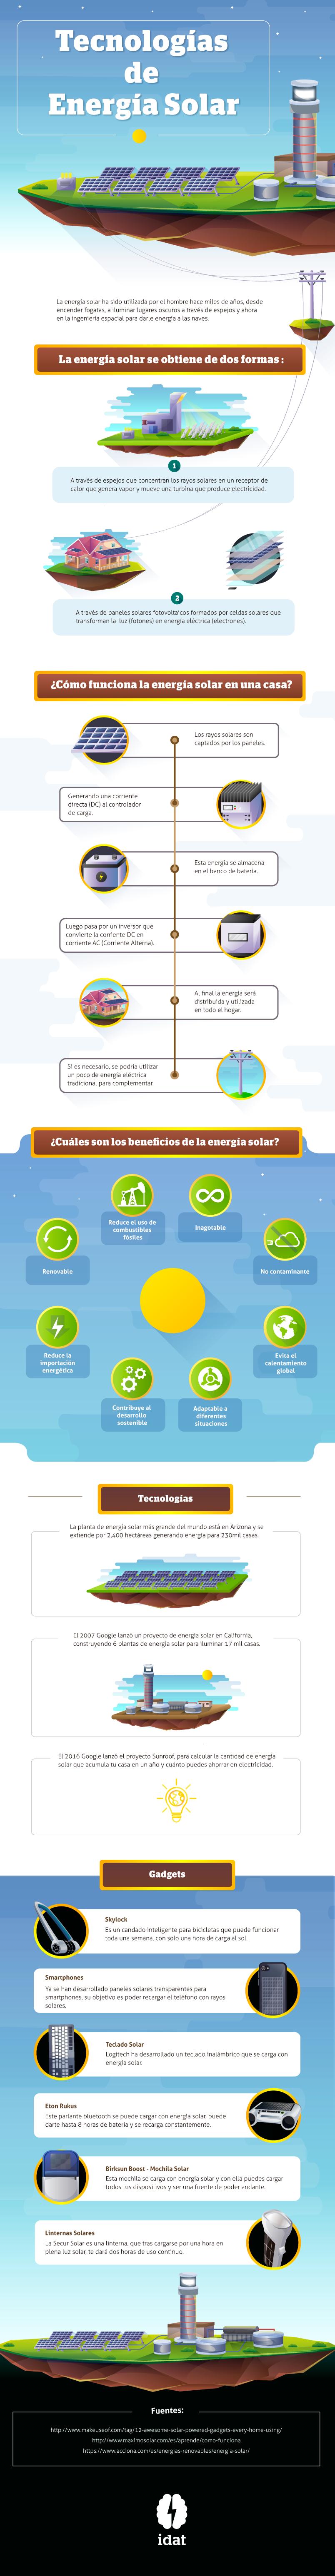 Infografía Tecnologías de Energía Solar.